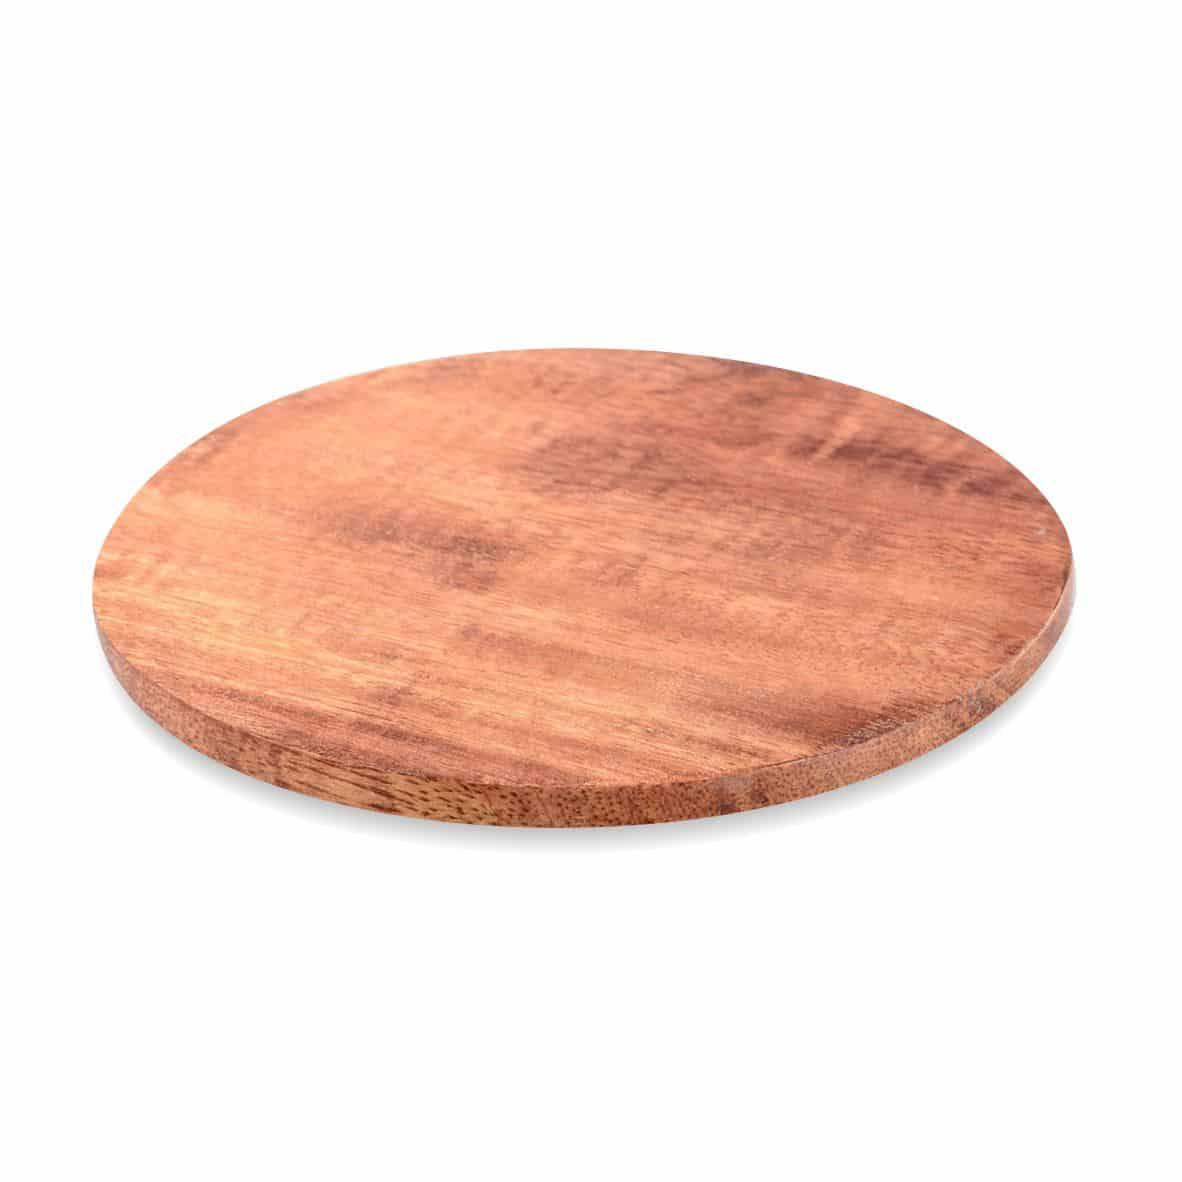 Kerzenteller Holz 140 mm, dunkel